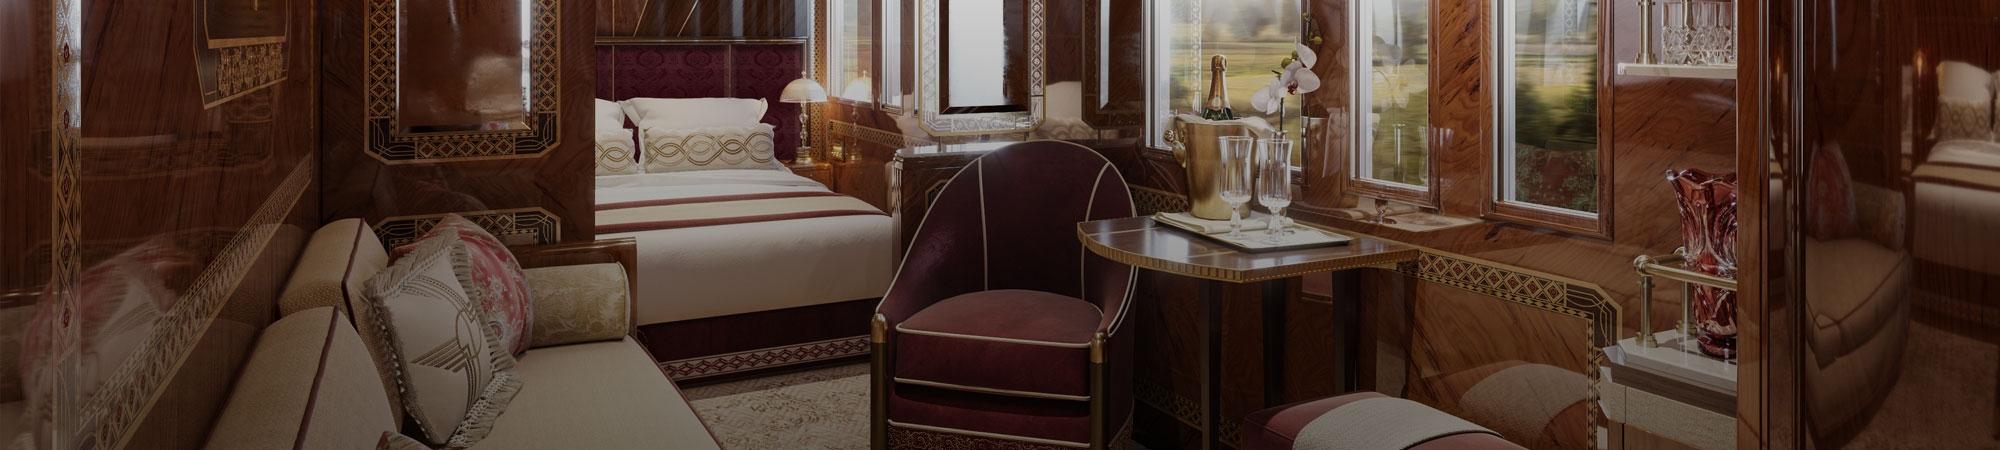 Three suites added to Belmond's Venice Simplon-Orient-Express